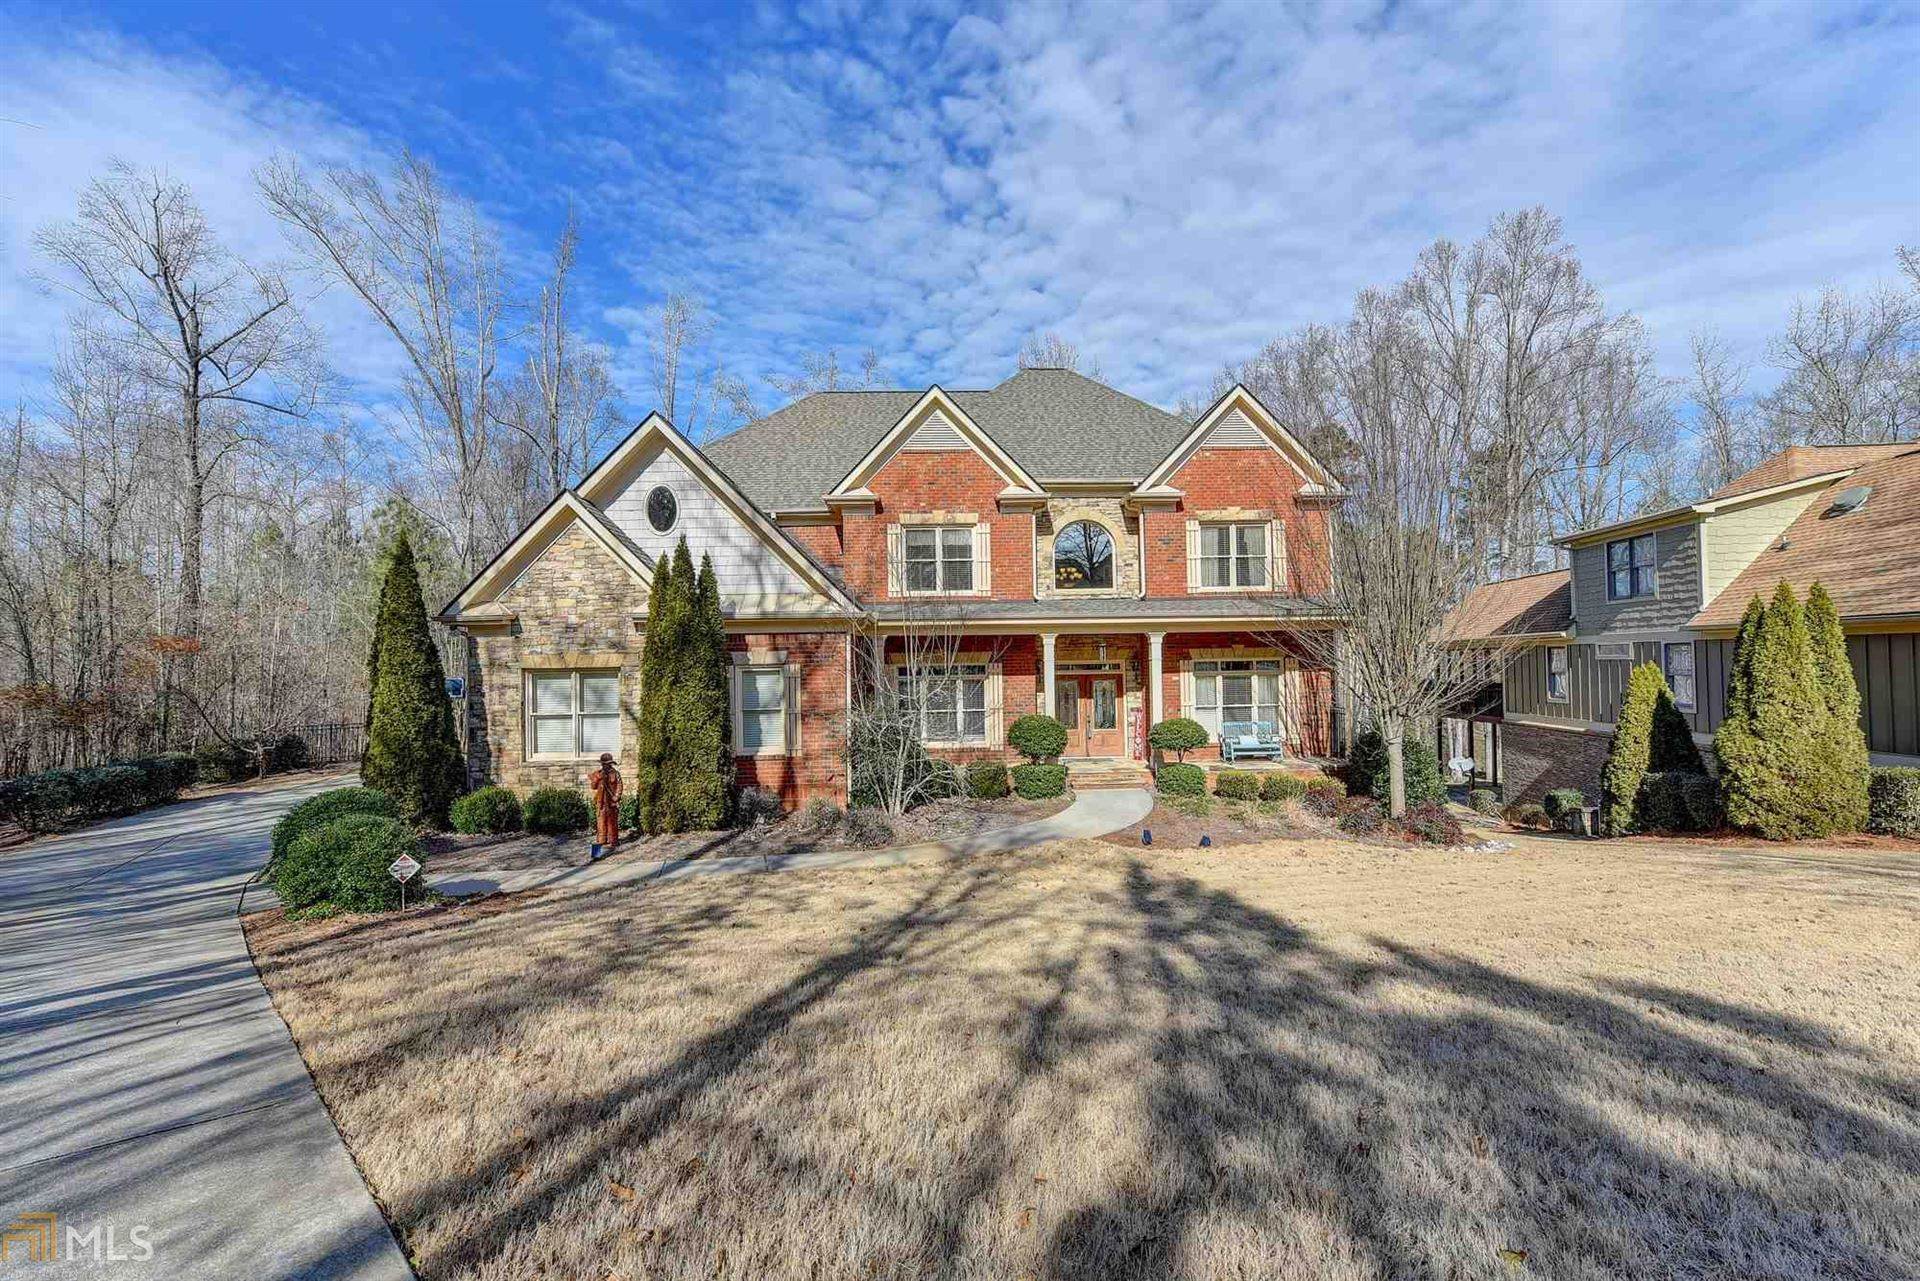 2045 Mill Pond Rd, Jefferson, GA 30549 - #: 8909674